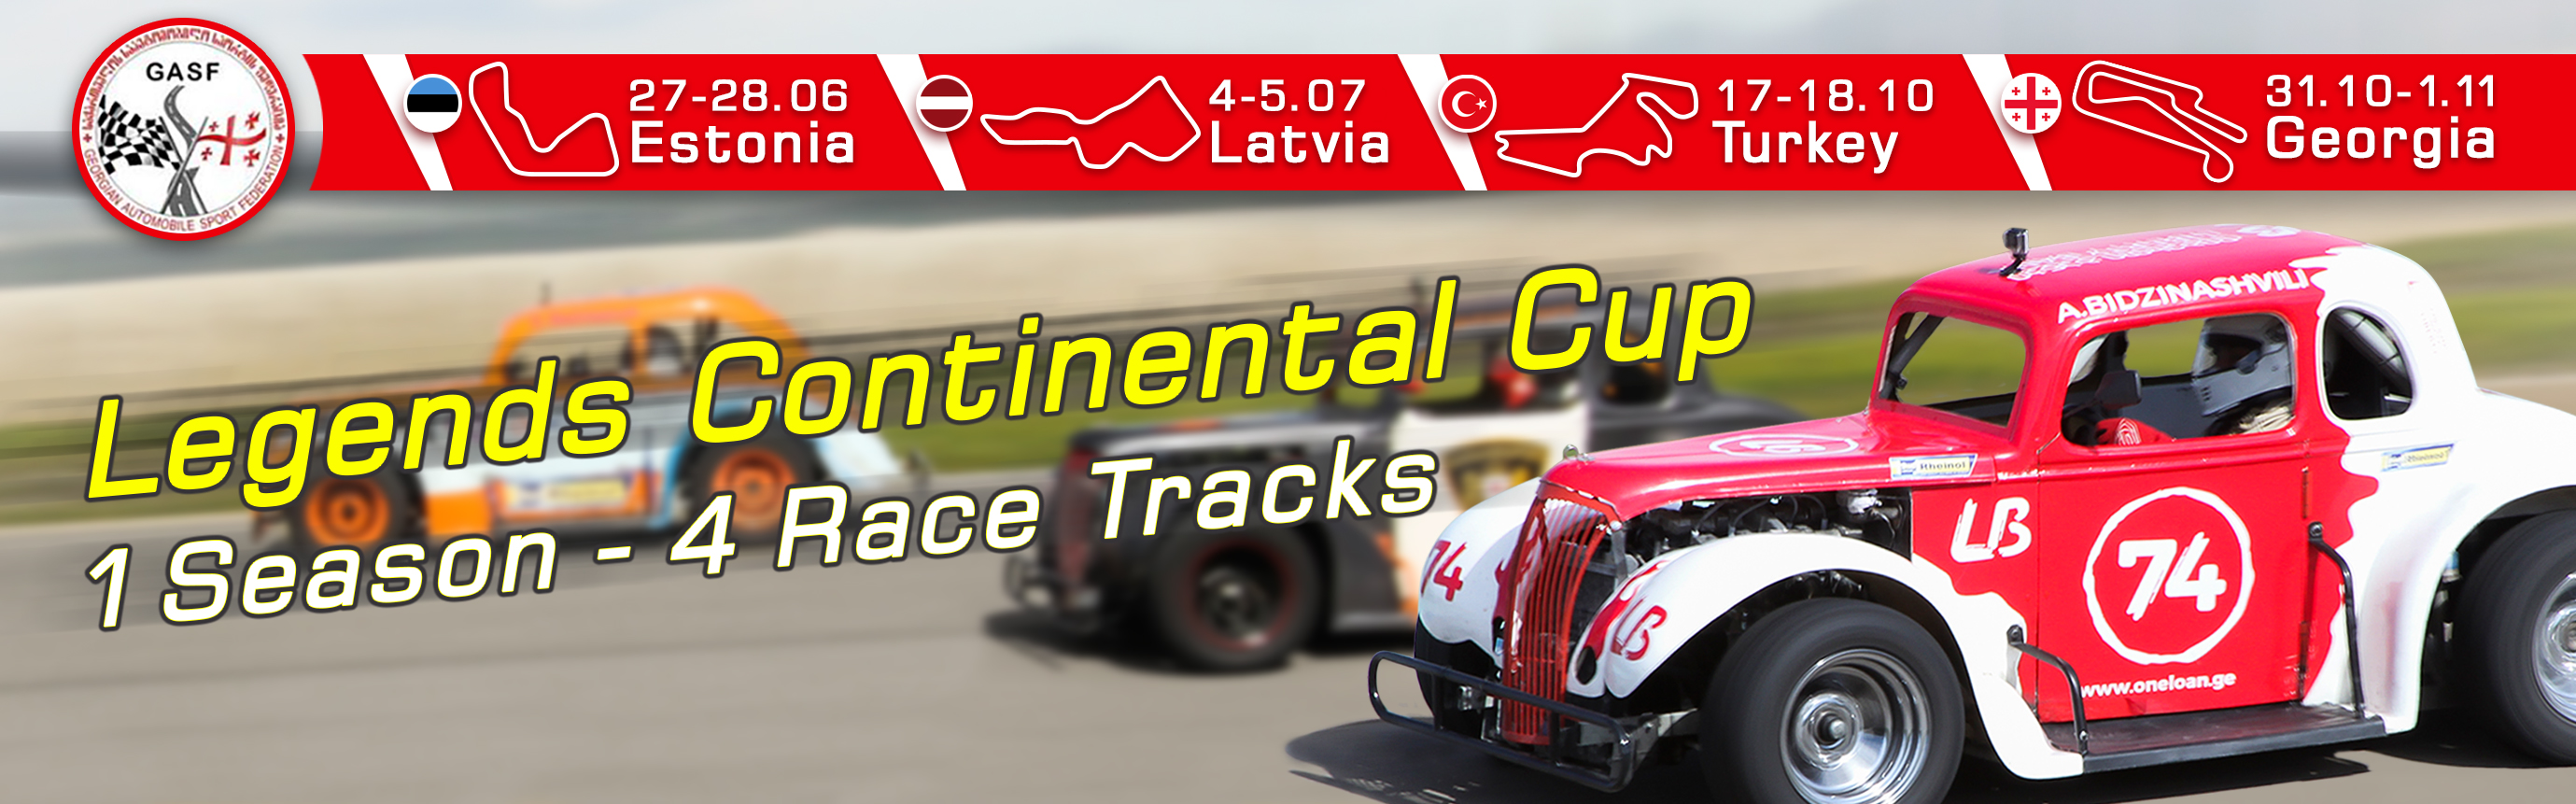 Legends Continental Cup – Rustavi International Motorpark